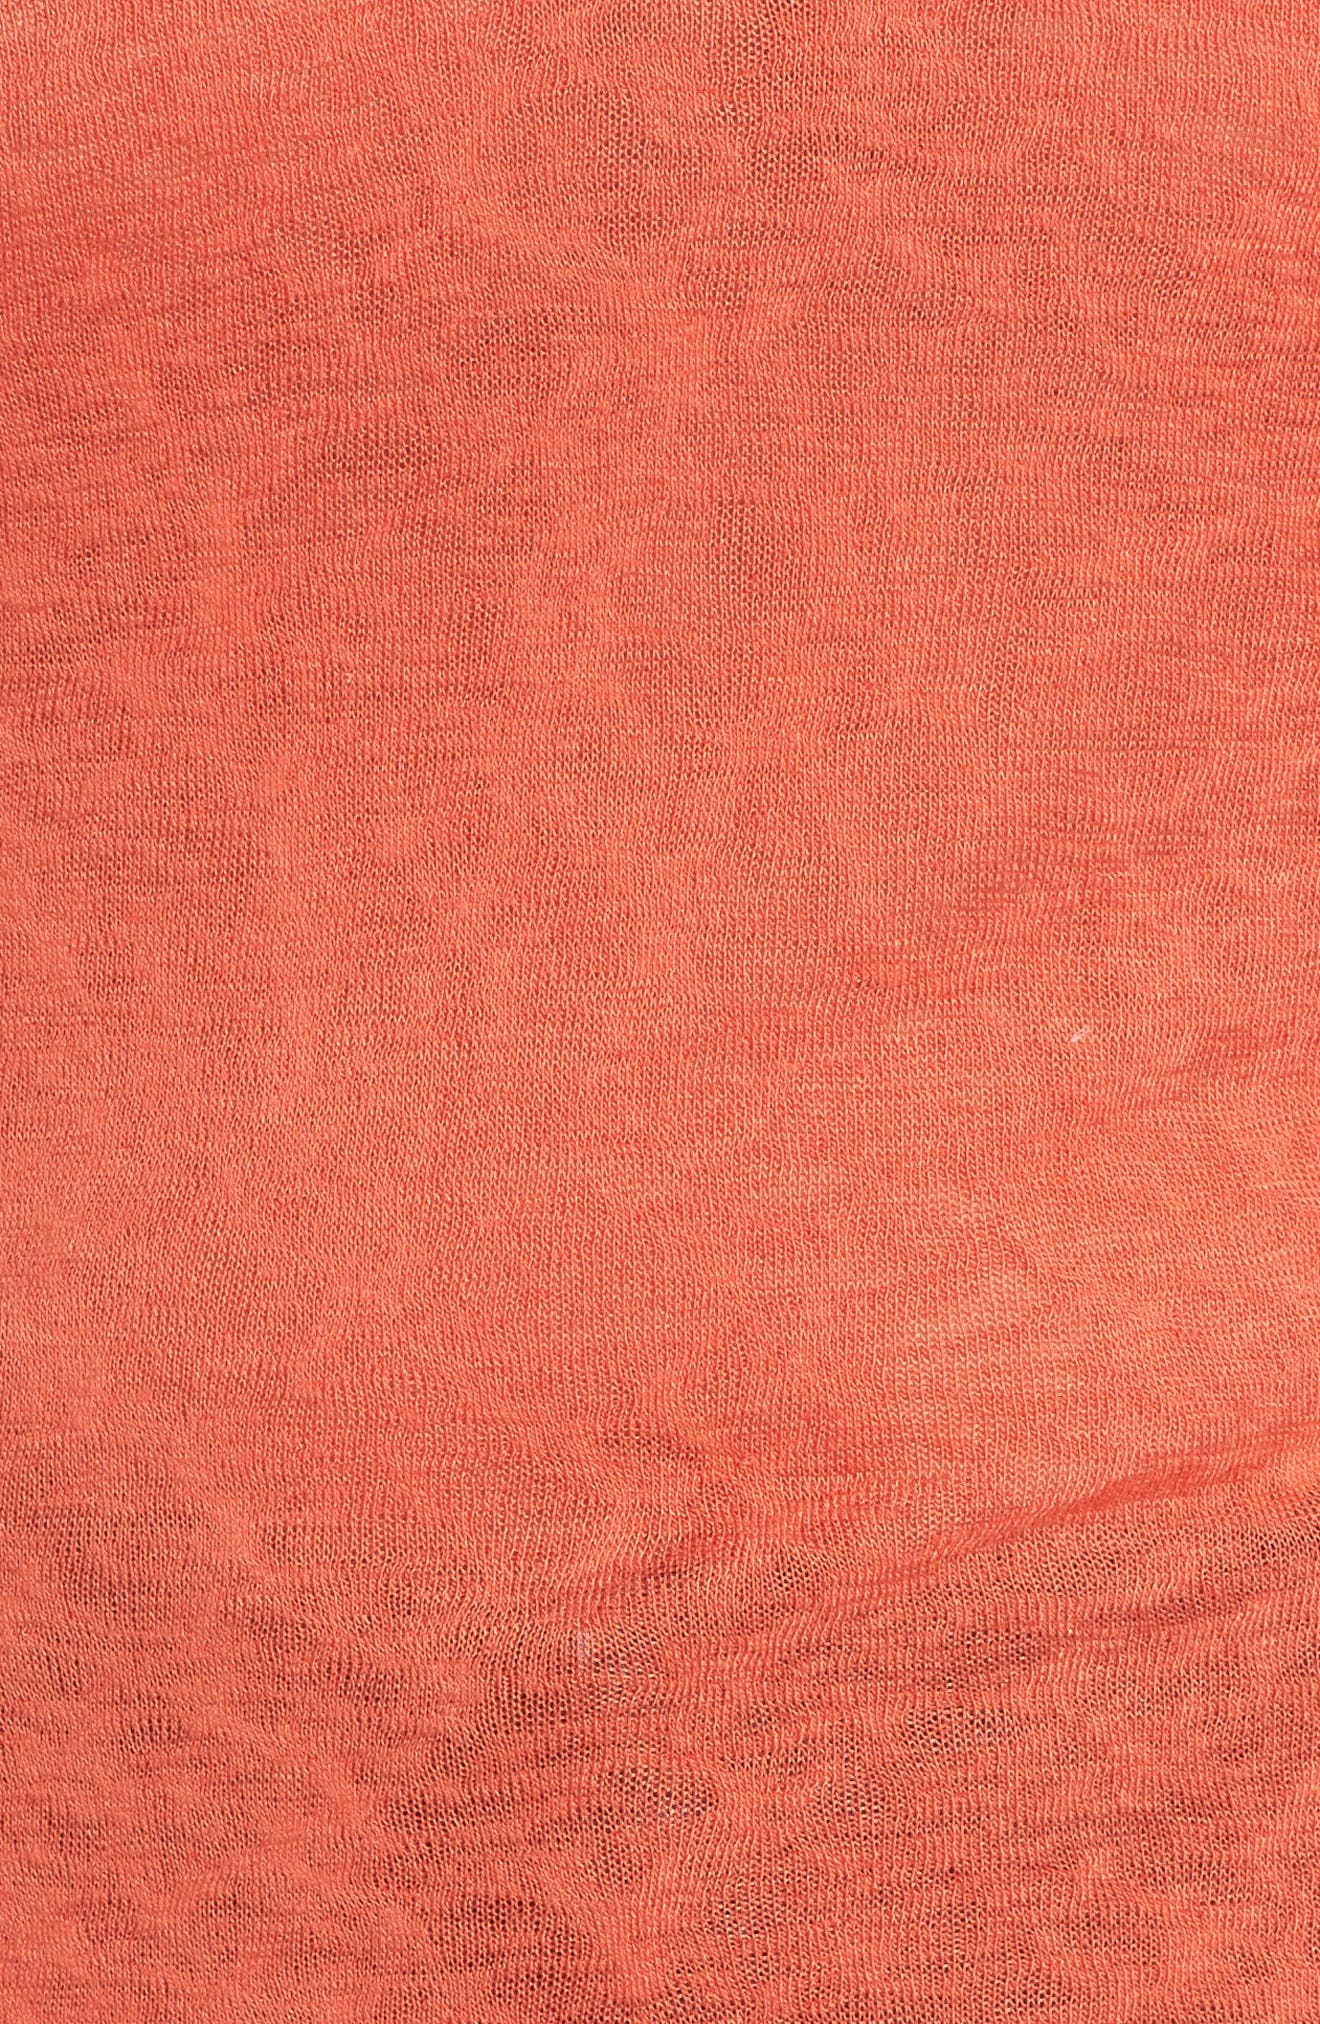 Tassel Trim Slub Knit Top,                             Alternate thumbnail 5, color,                             Orange